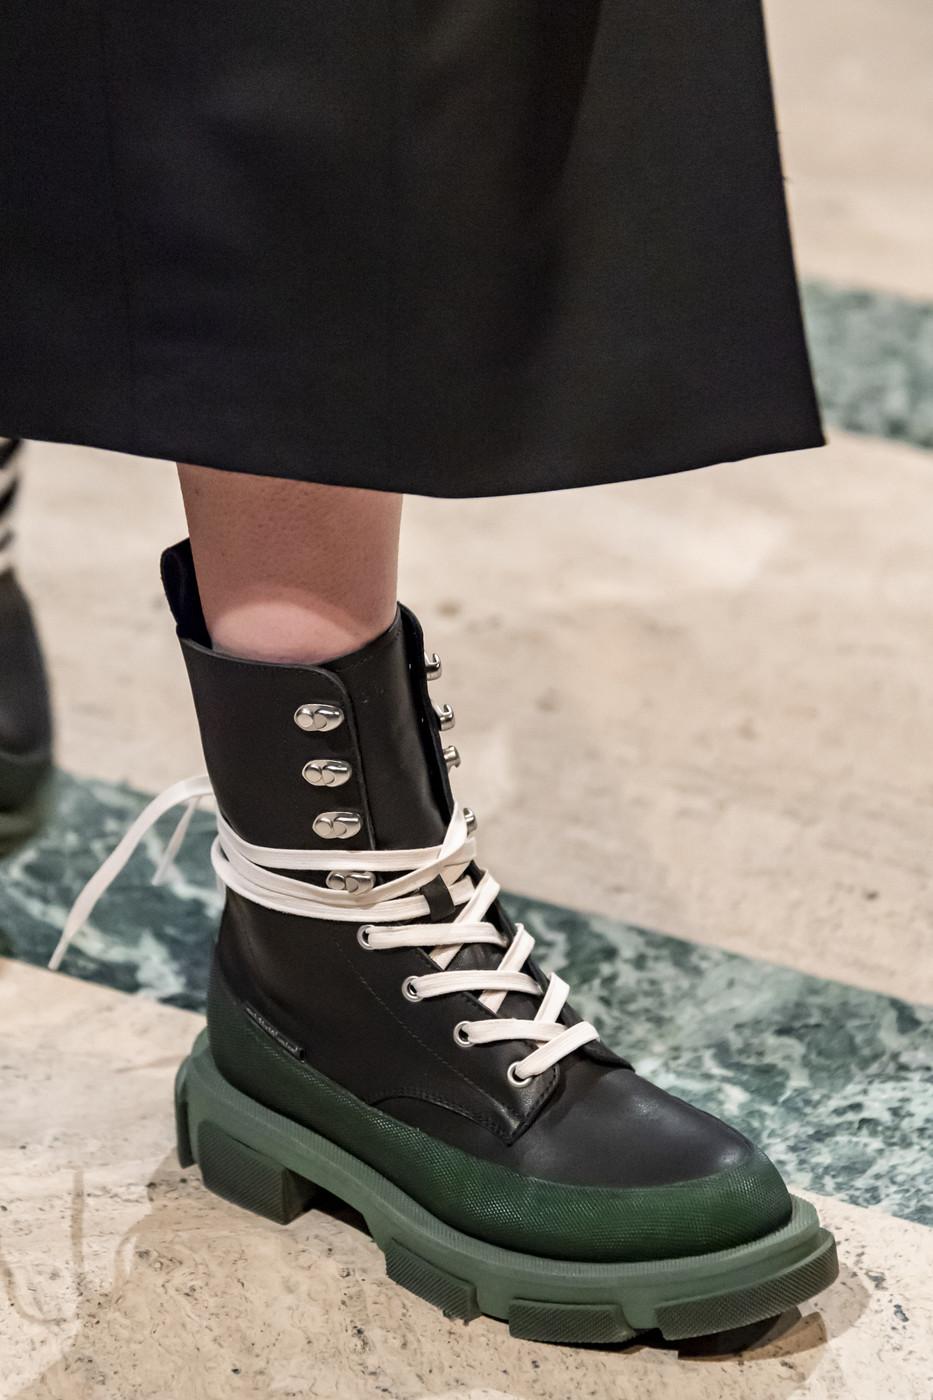 Monse At New York Fashion Week Fall 2020 Fashion Shoes Monse Trending Shoes